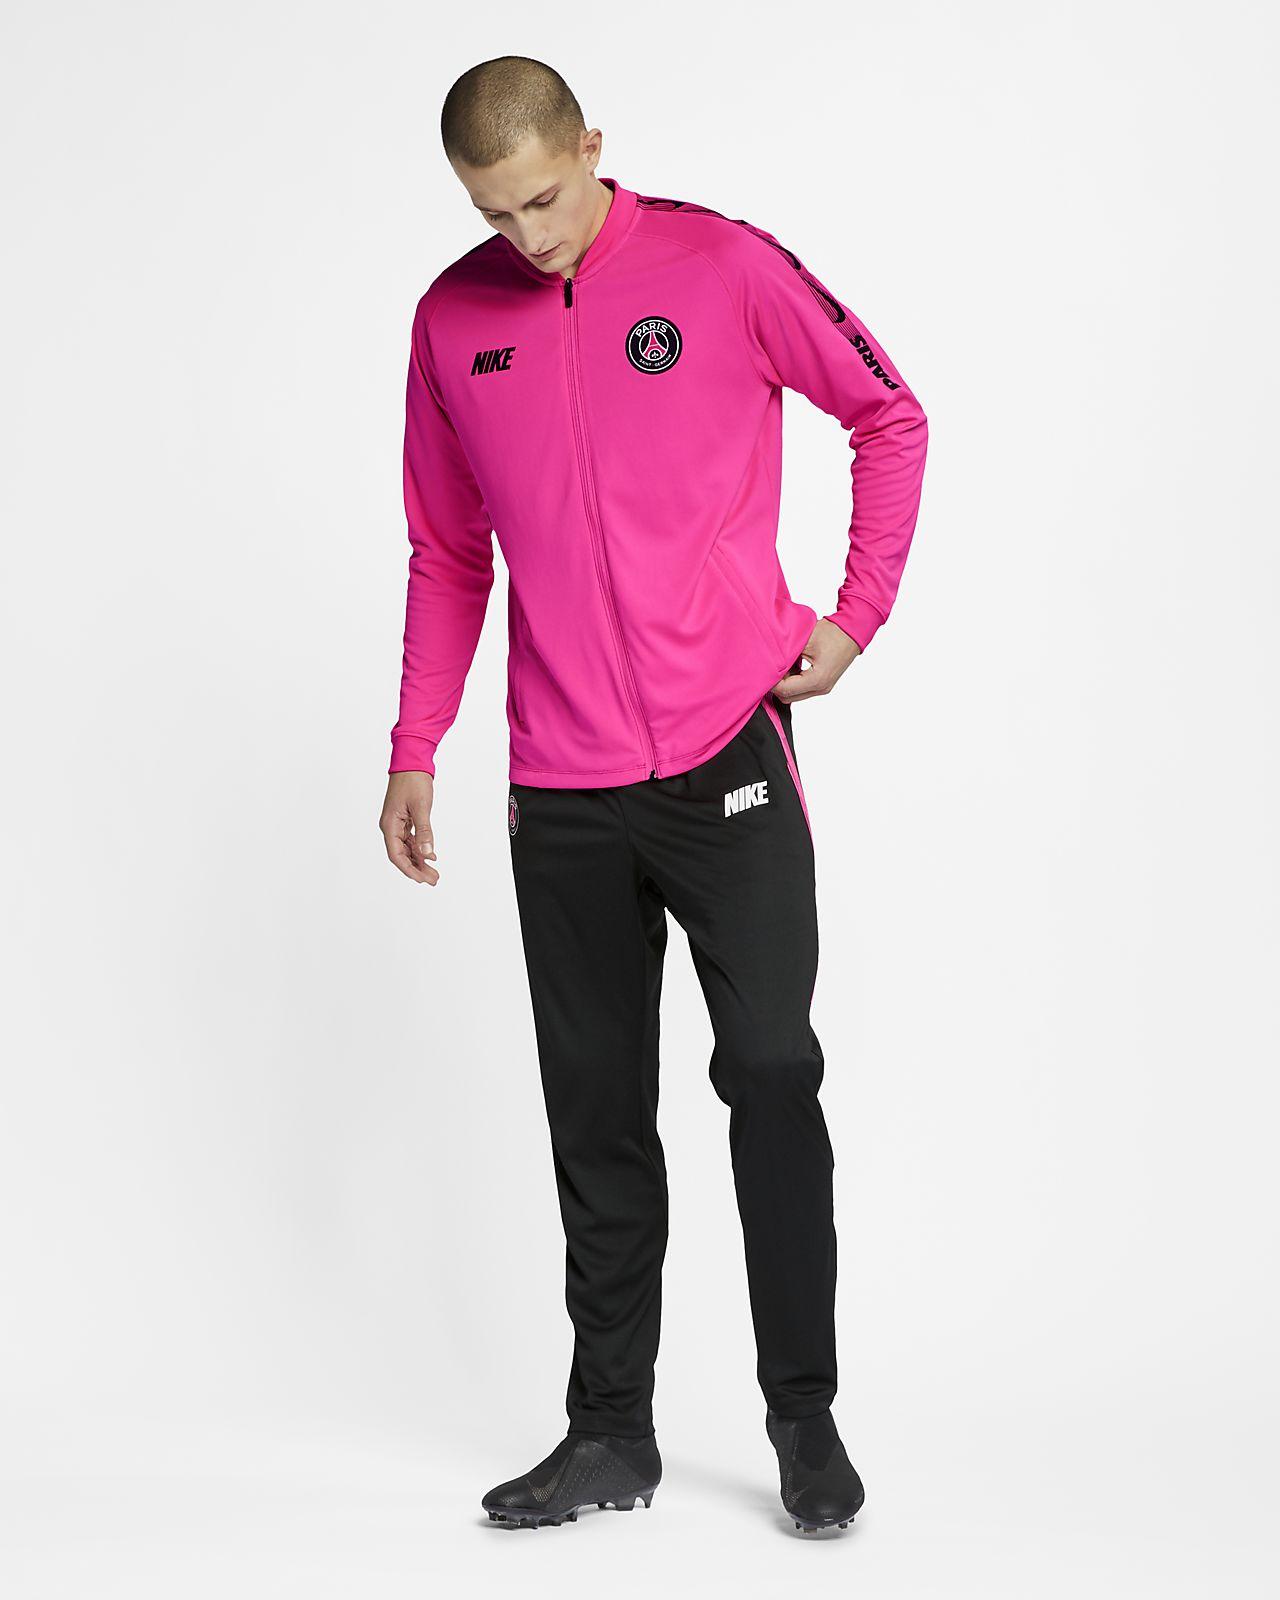 c4a75ee59 Paris Saint-Germain Dri-FIT Squad Men s Football Track Suit. Nike.com CA